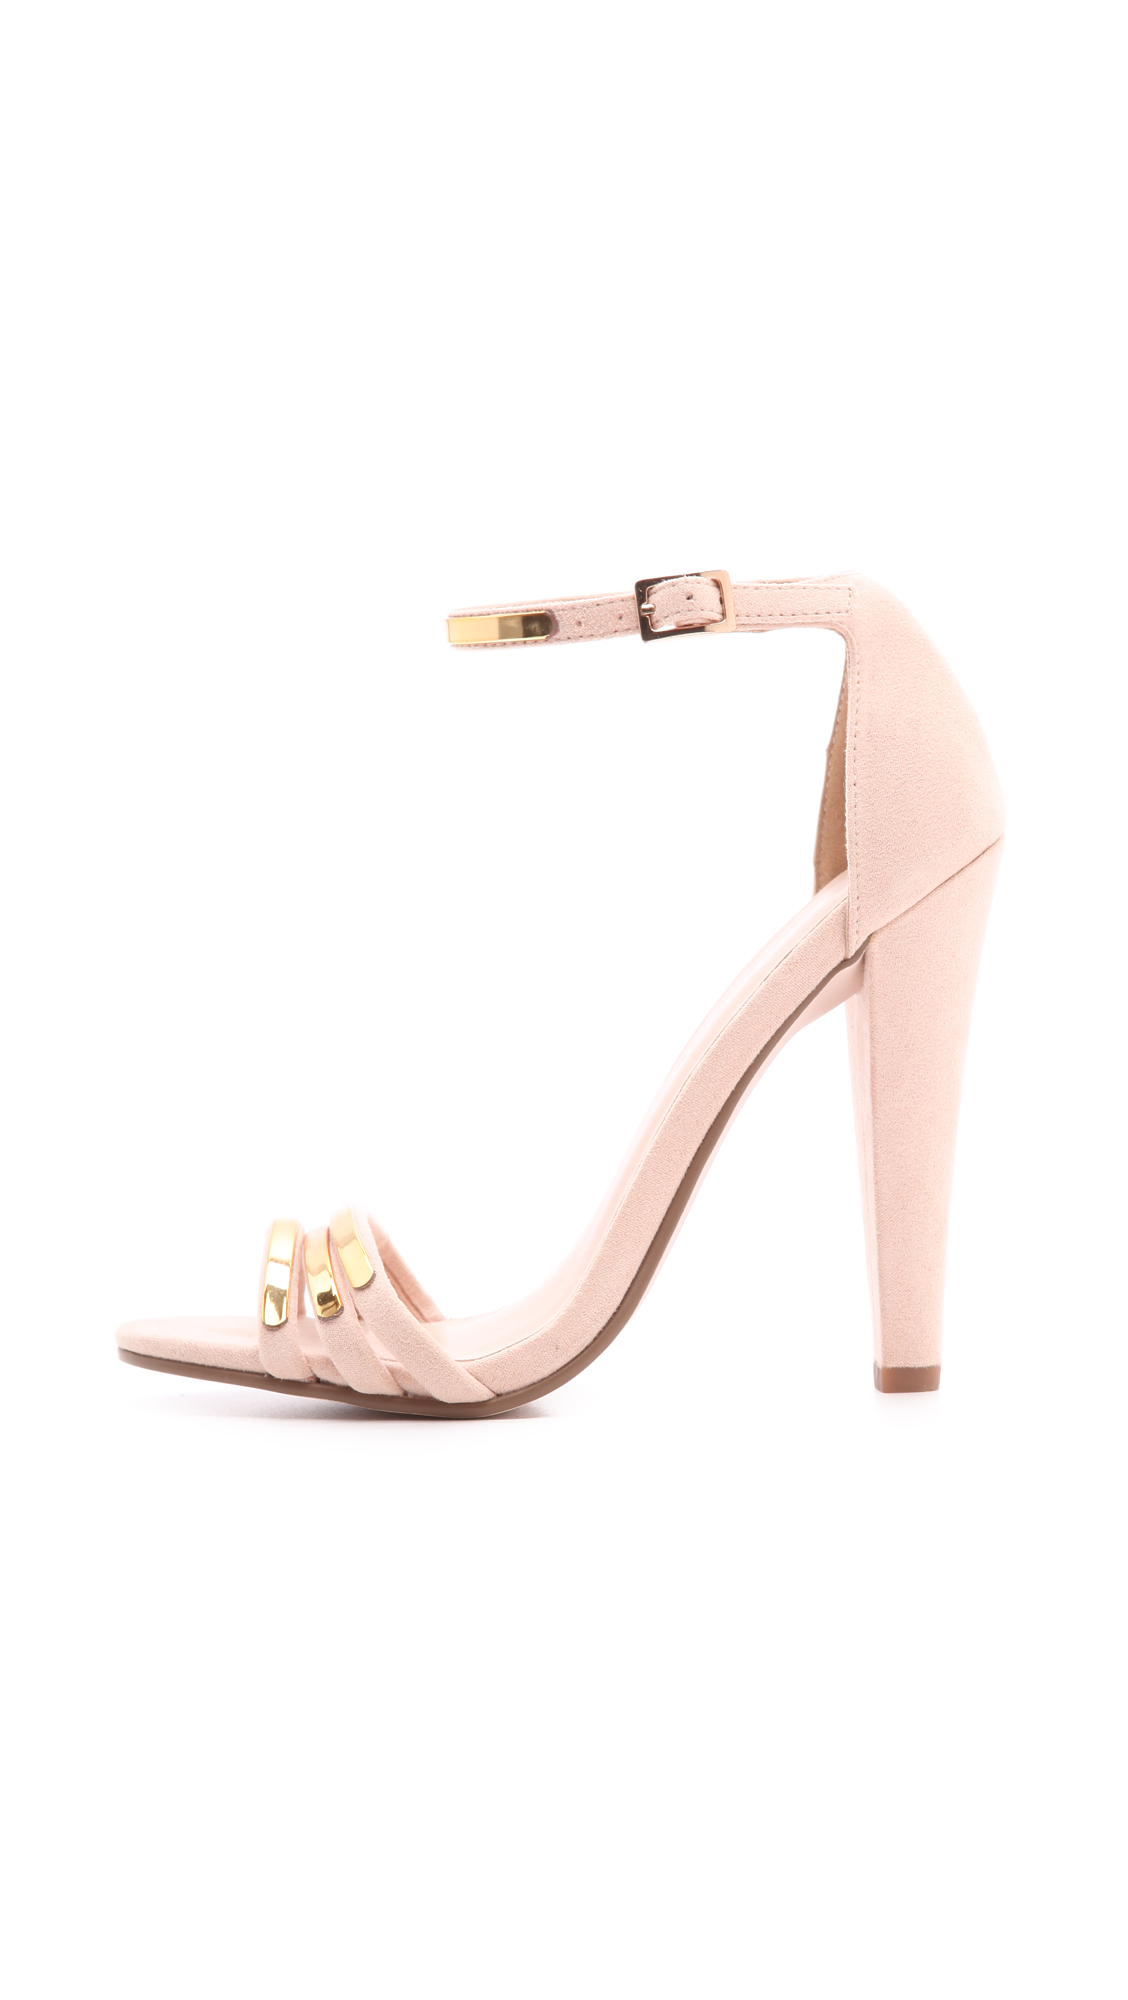 ebony metallic high heel sandals from MISS KG | Sandals